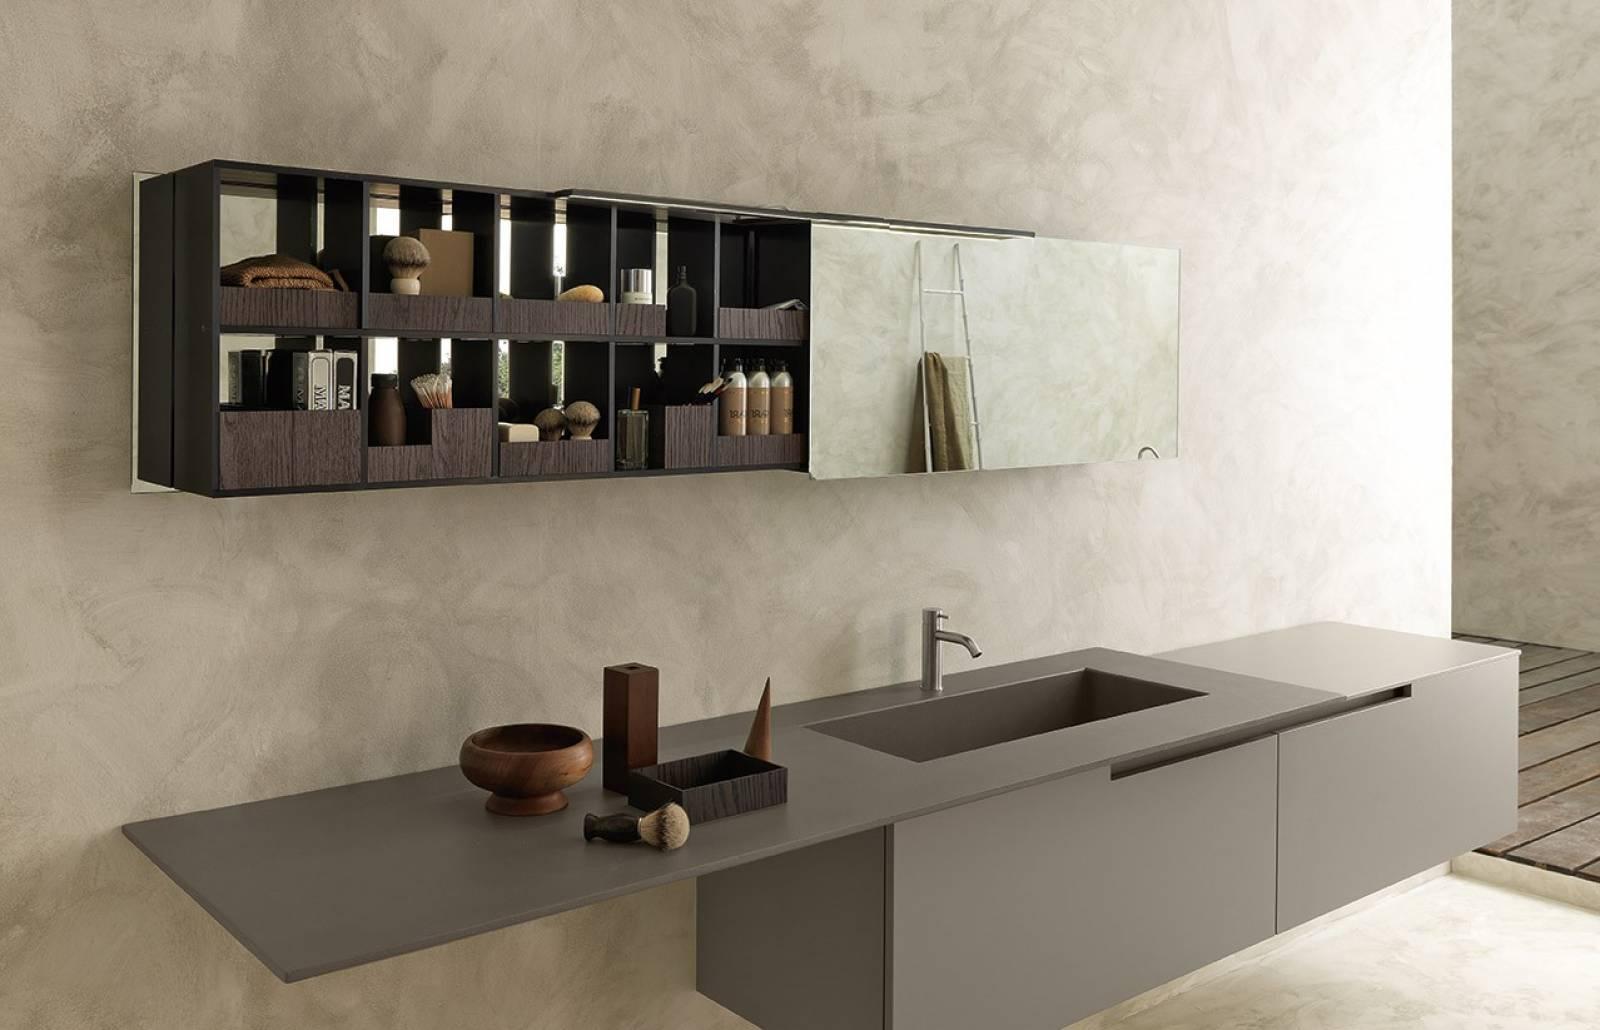 Salle De Bain Pour Architecture Design Cuisine Italienne Design